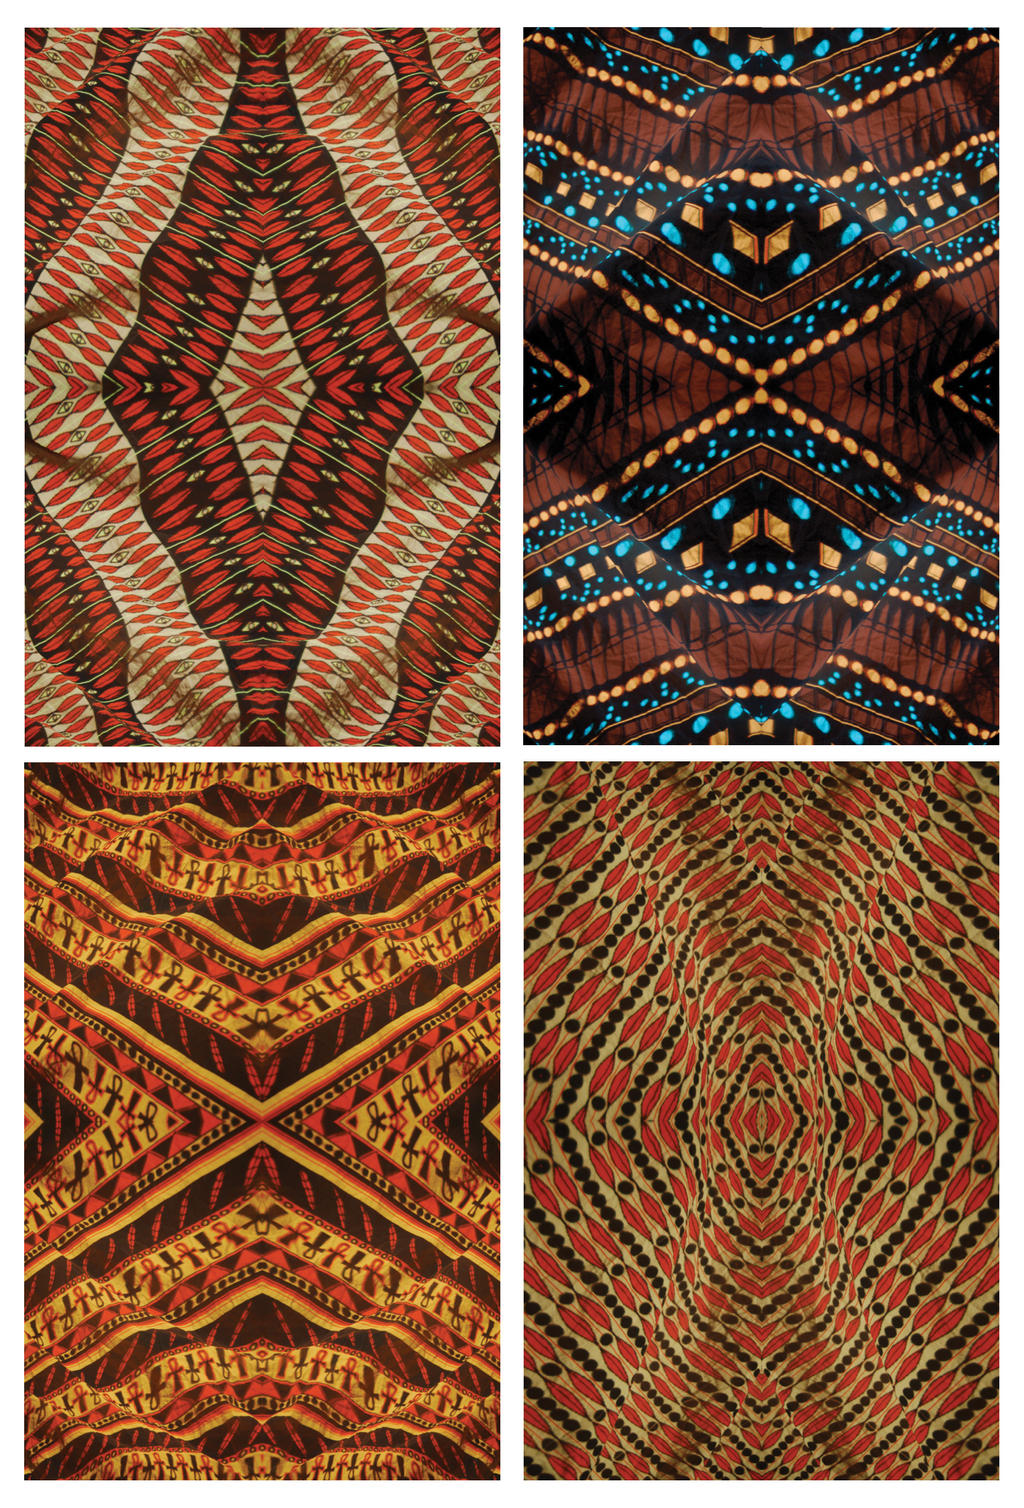 African patterns art - photo#8